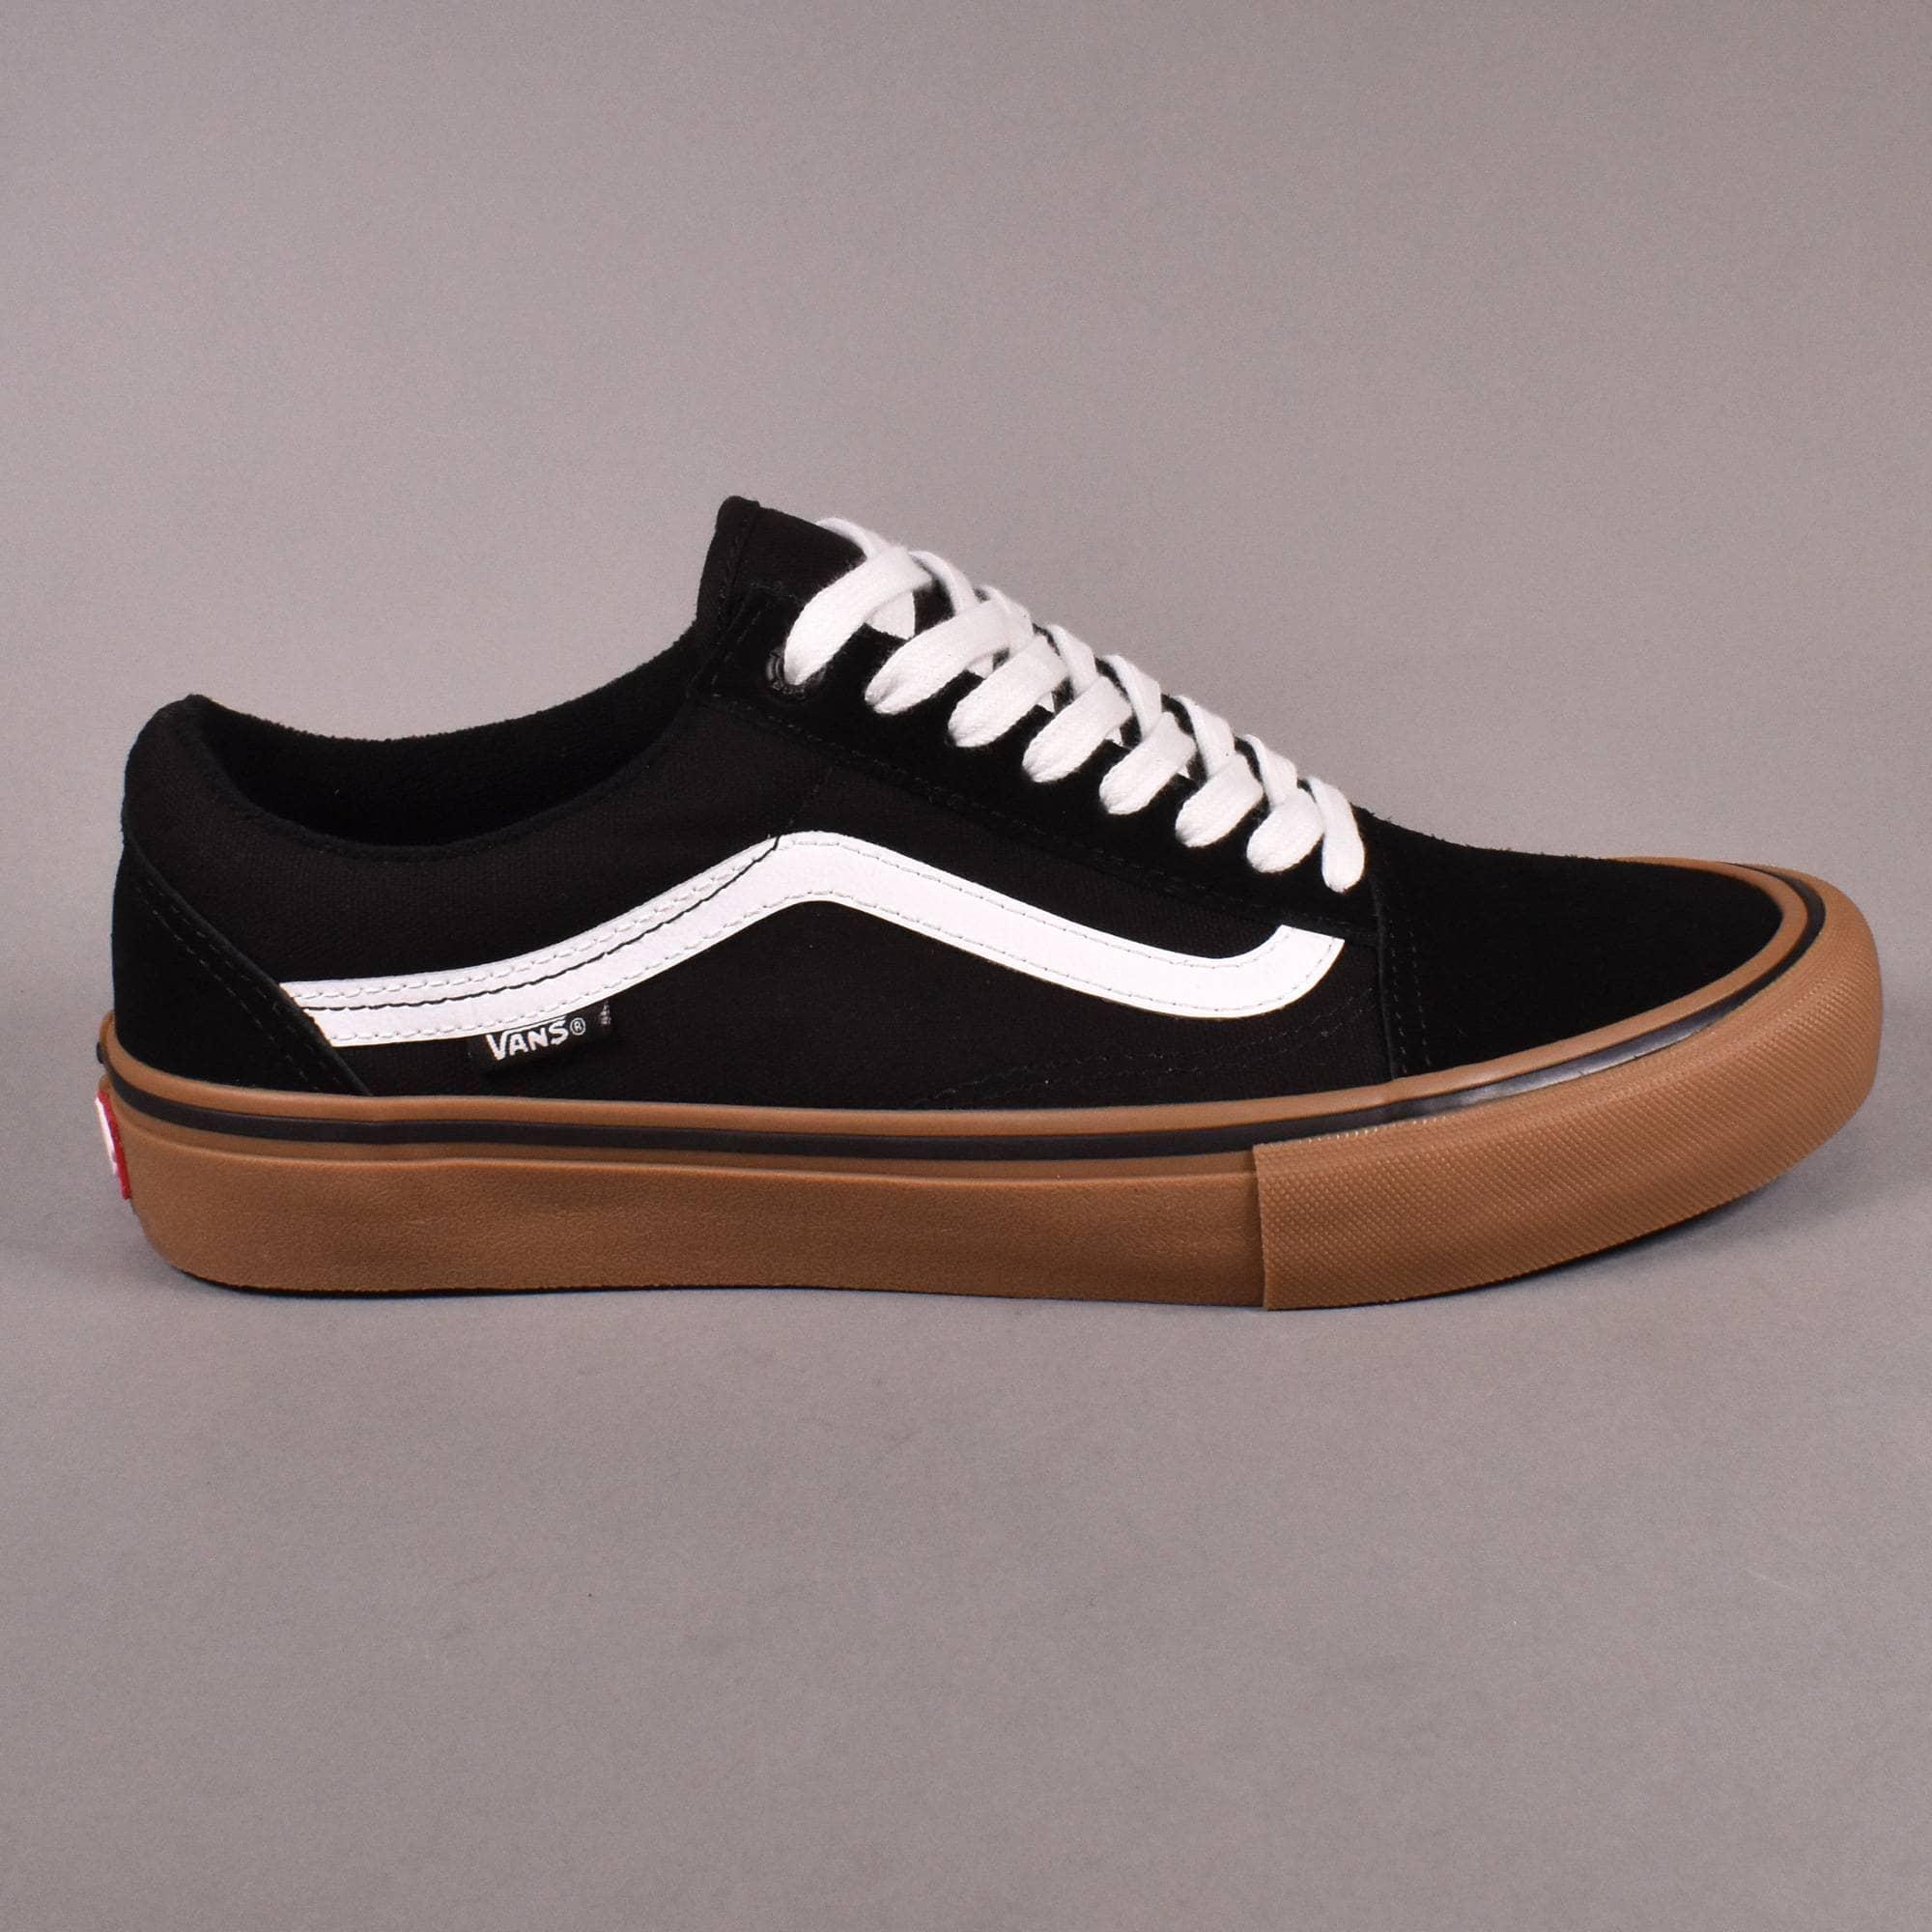 Vans Old Skool Pro Skate Shoes - Black